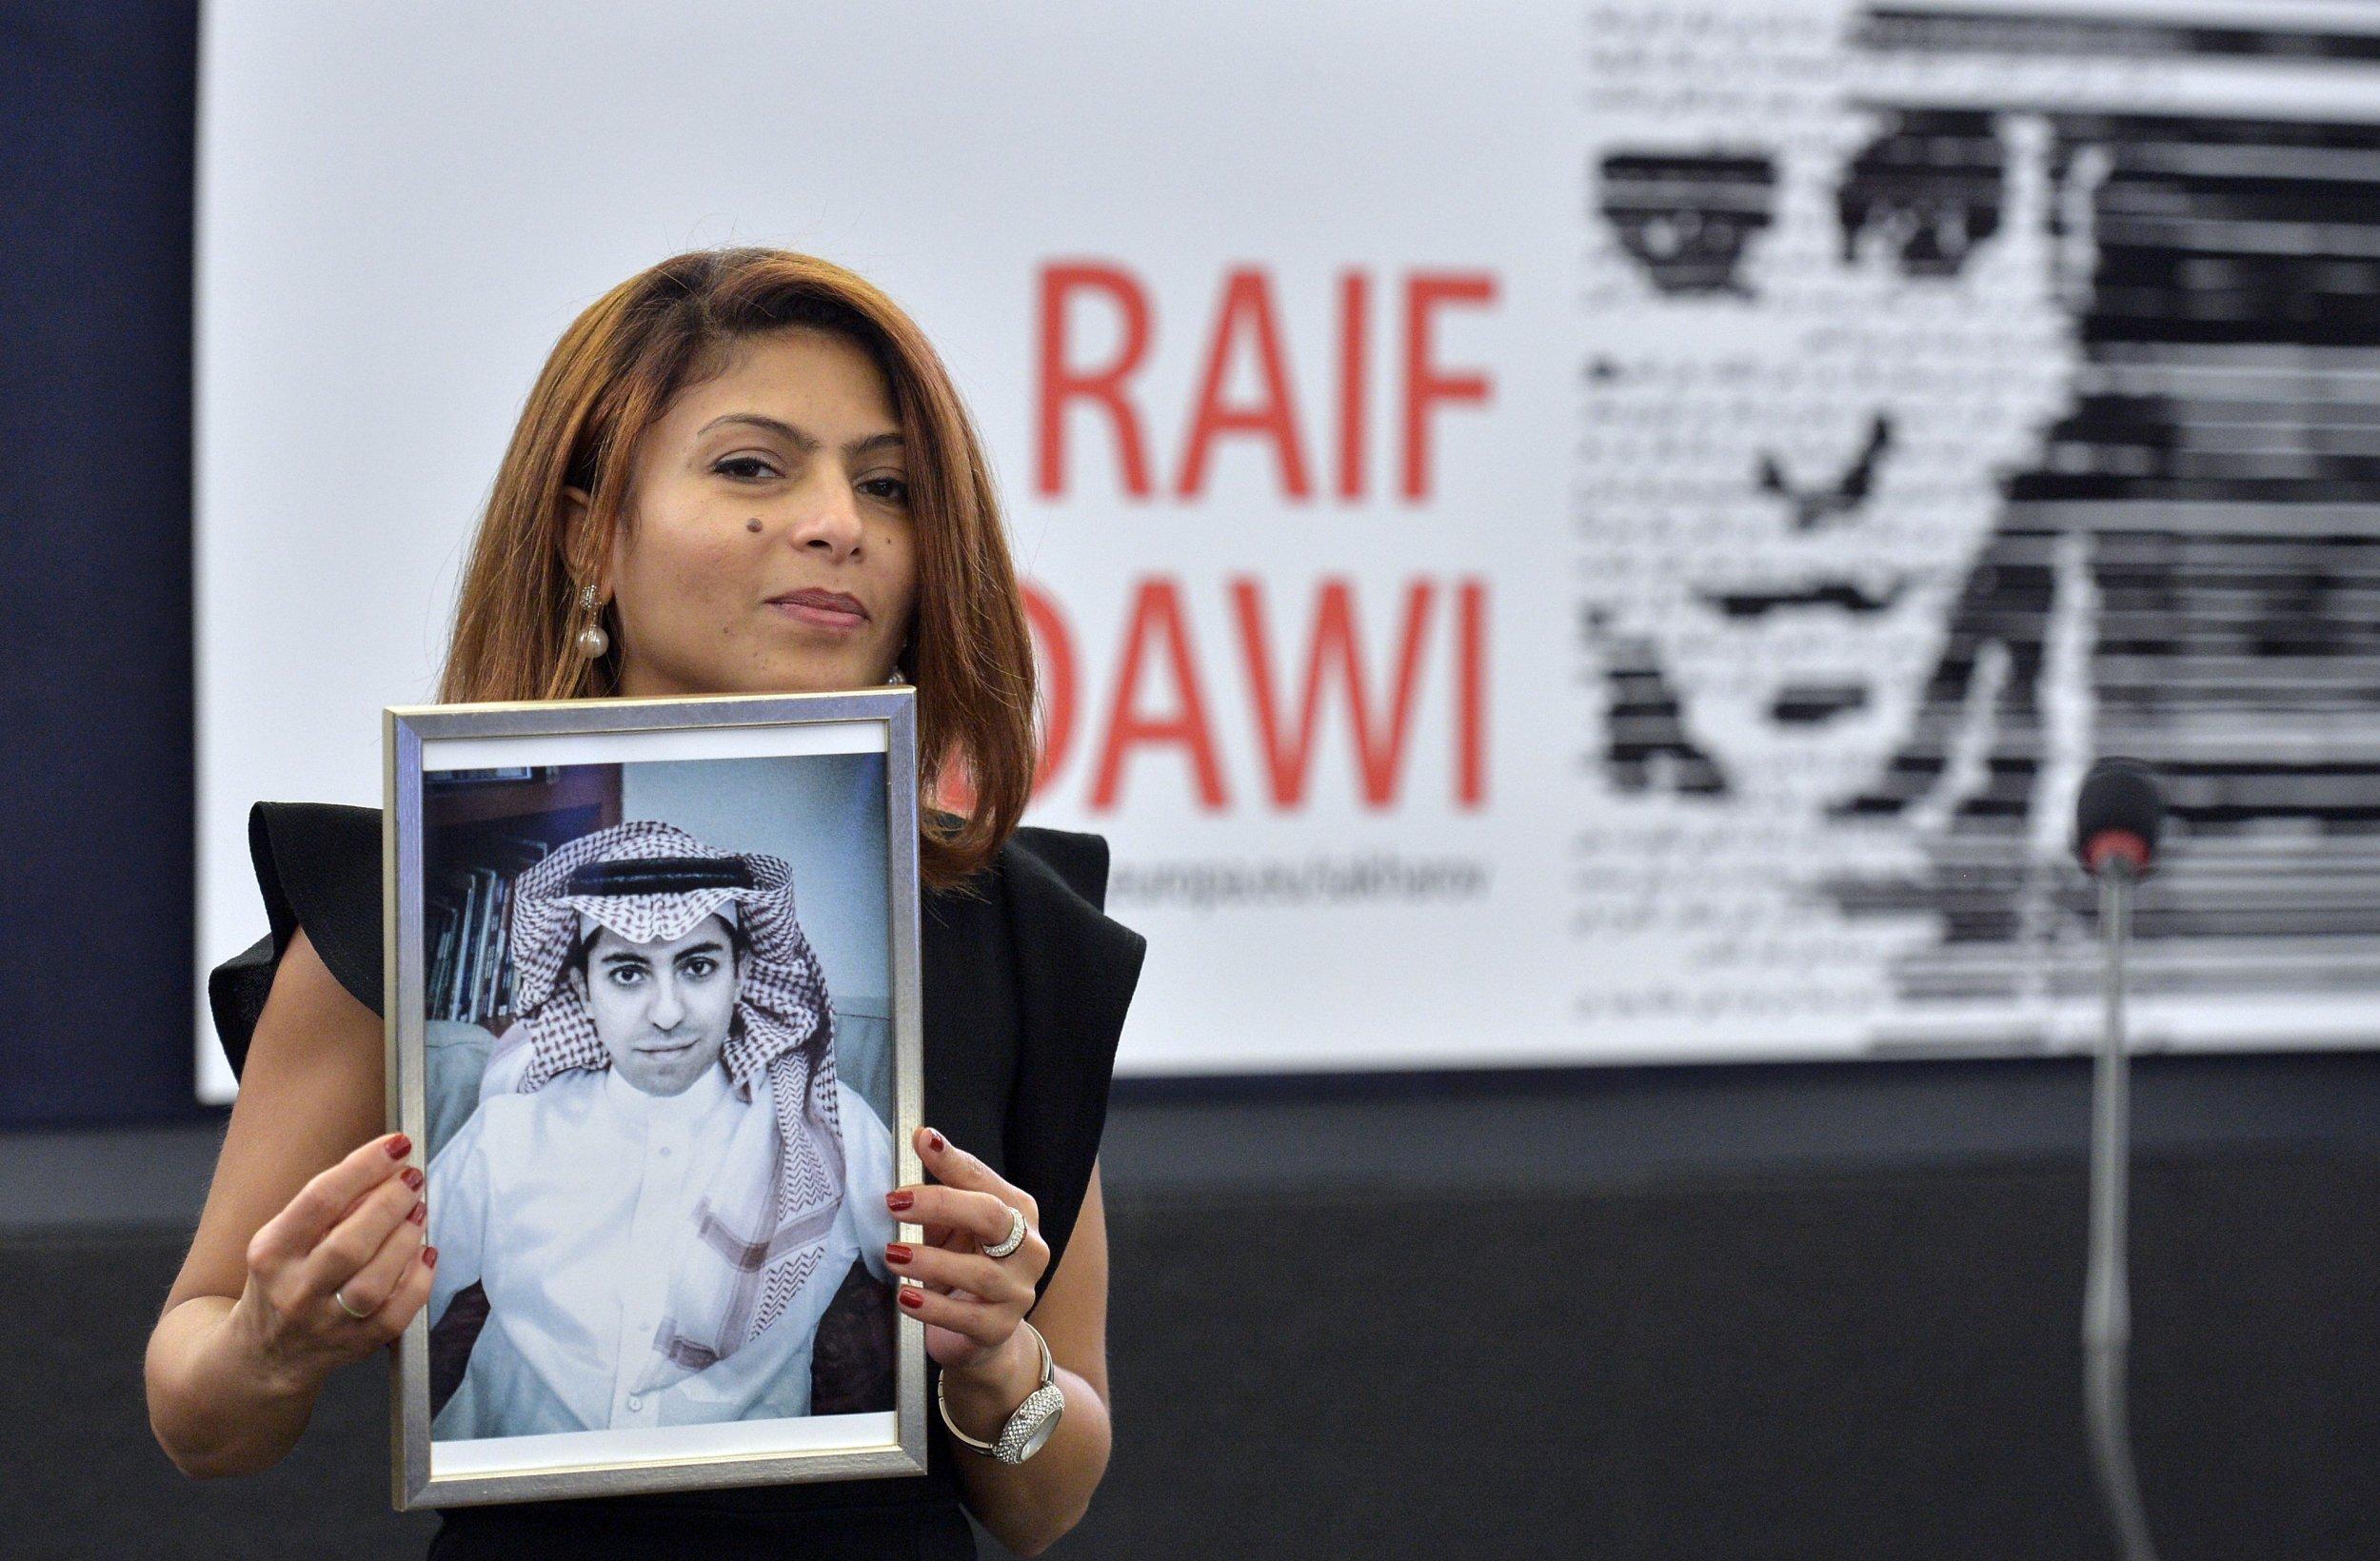 Ensaf Haidar and Raif Badawi